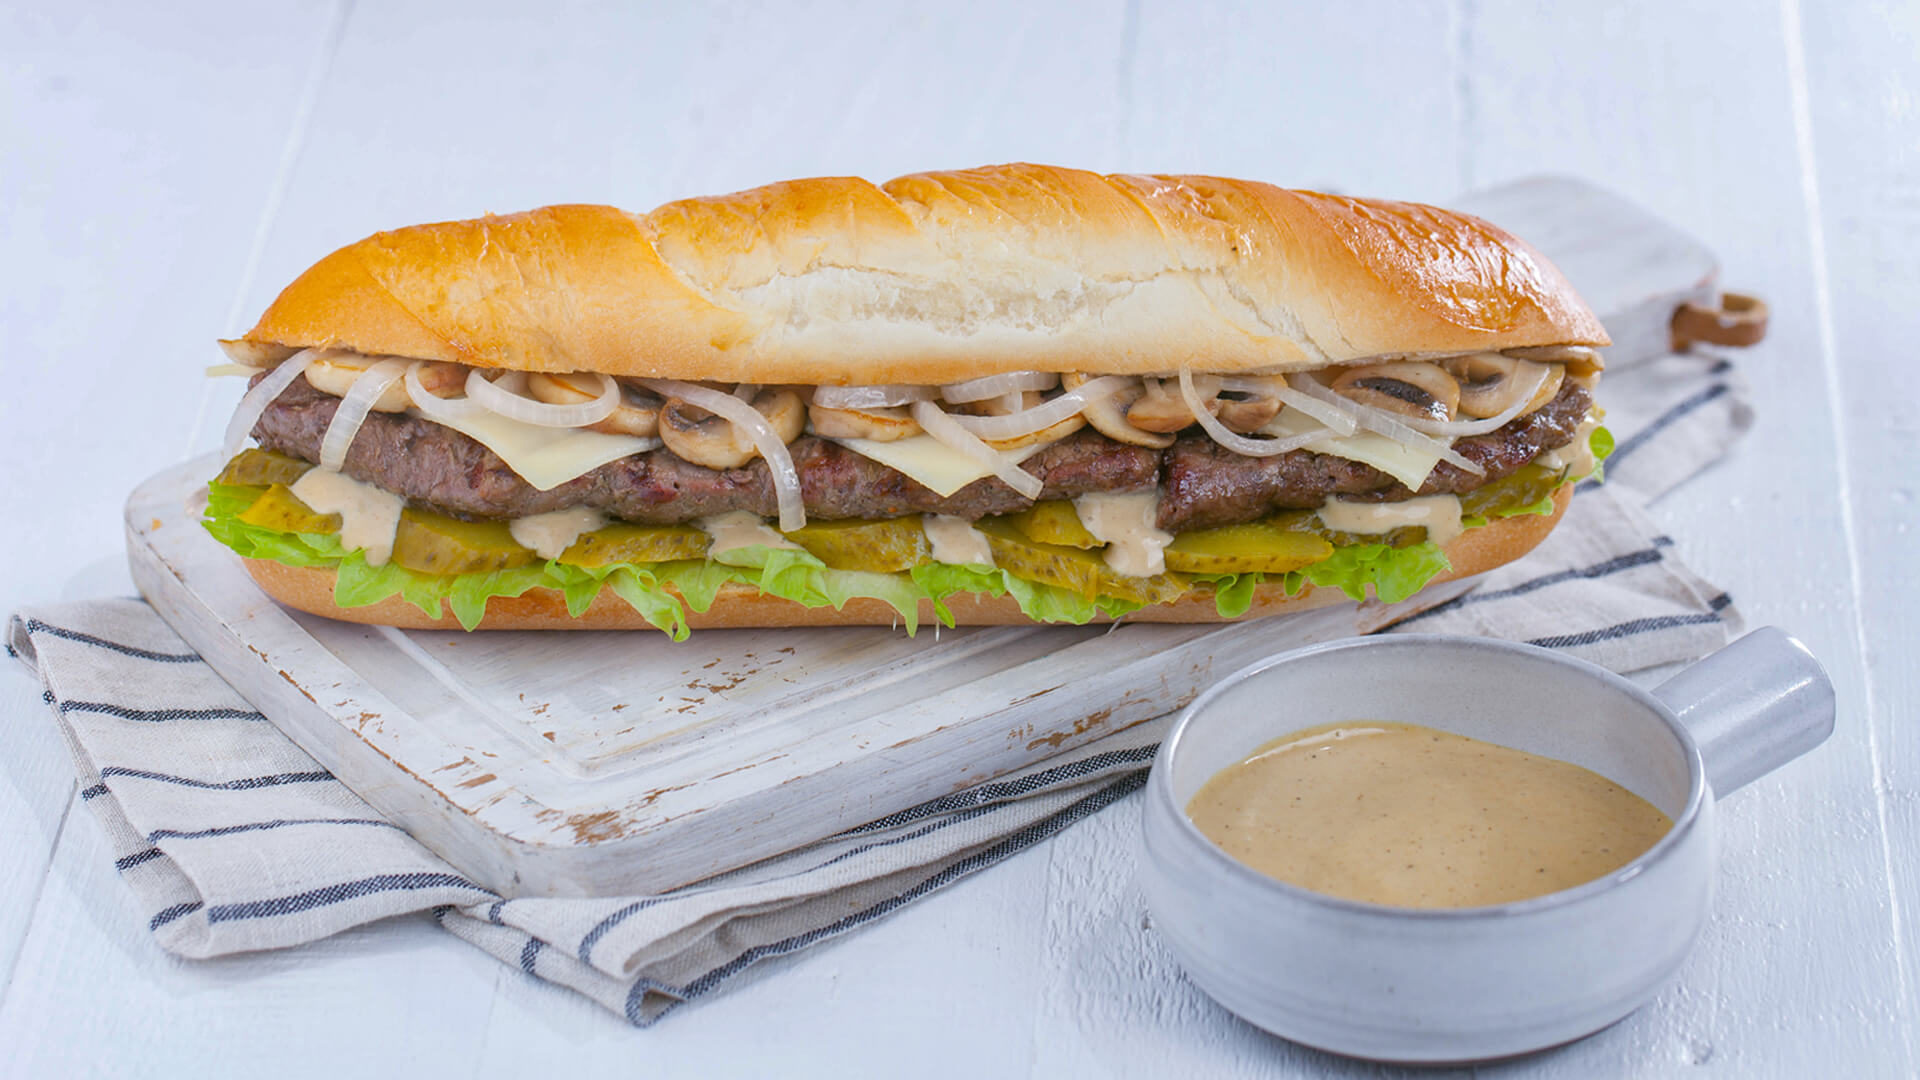 Beef Mushroom Sandwich